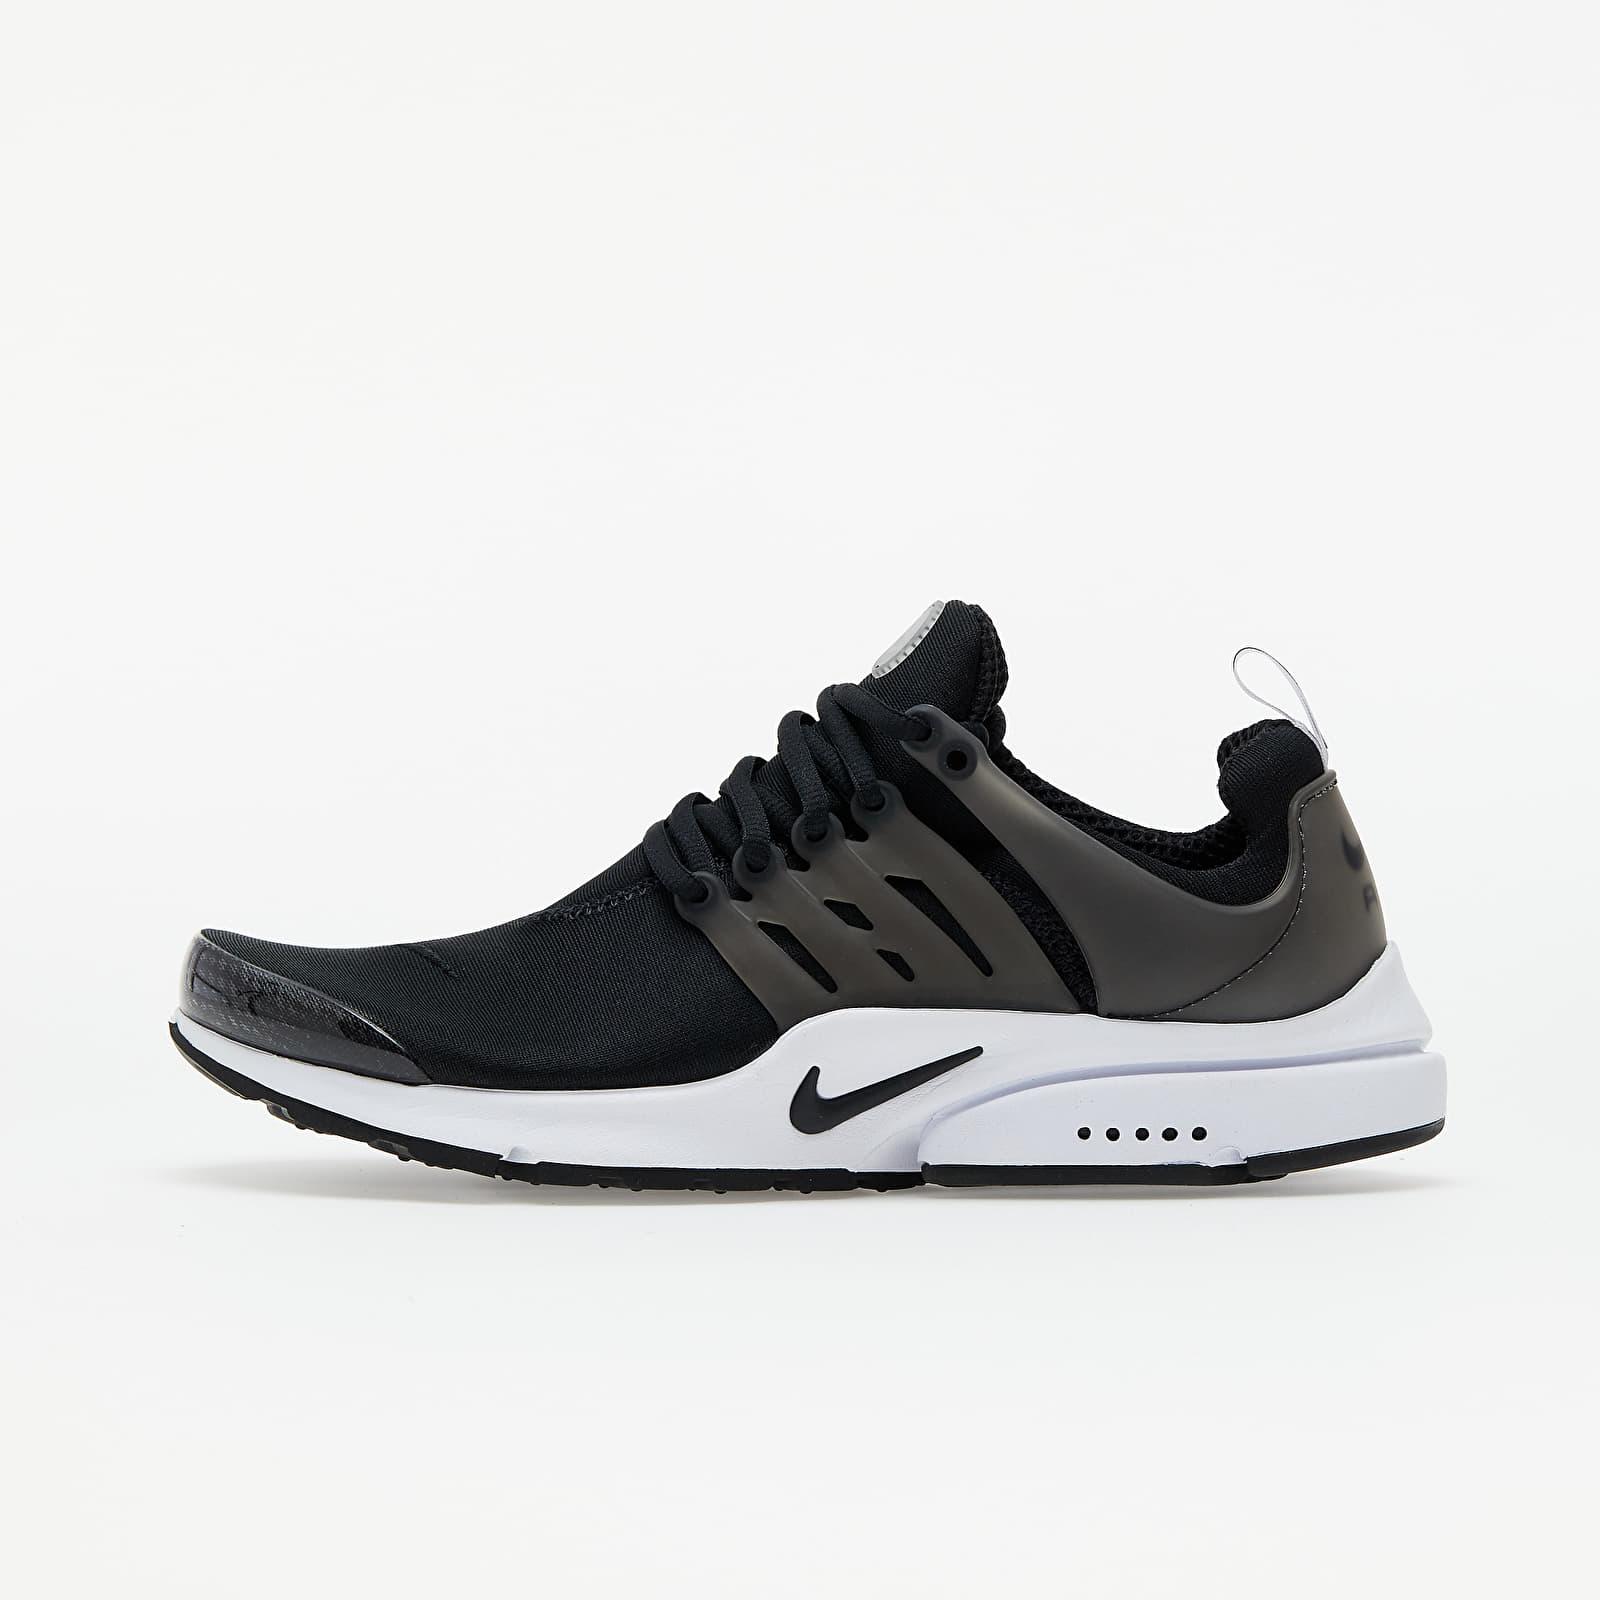 Nike Air Presto Black/ Black-White EUR 42.5